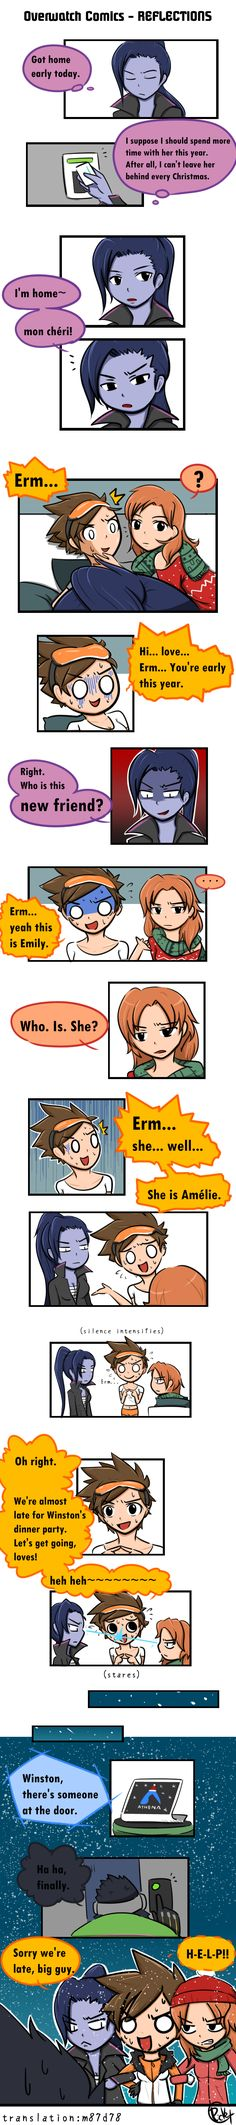 Overwatch Comics - REFLECTIONS #comics #emily #manga #overwatch #reflections #tracer #widowmaker #widowtracer